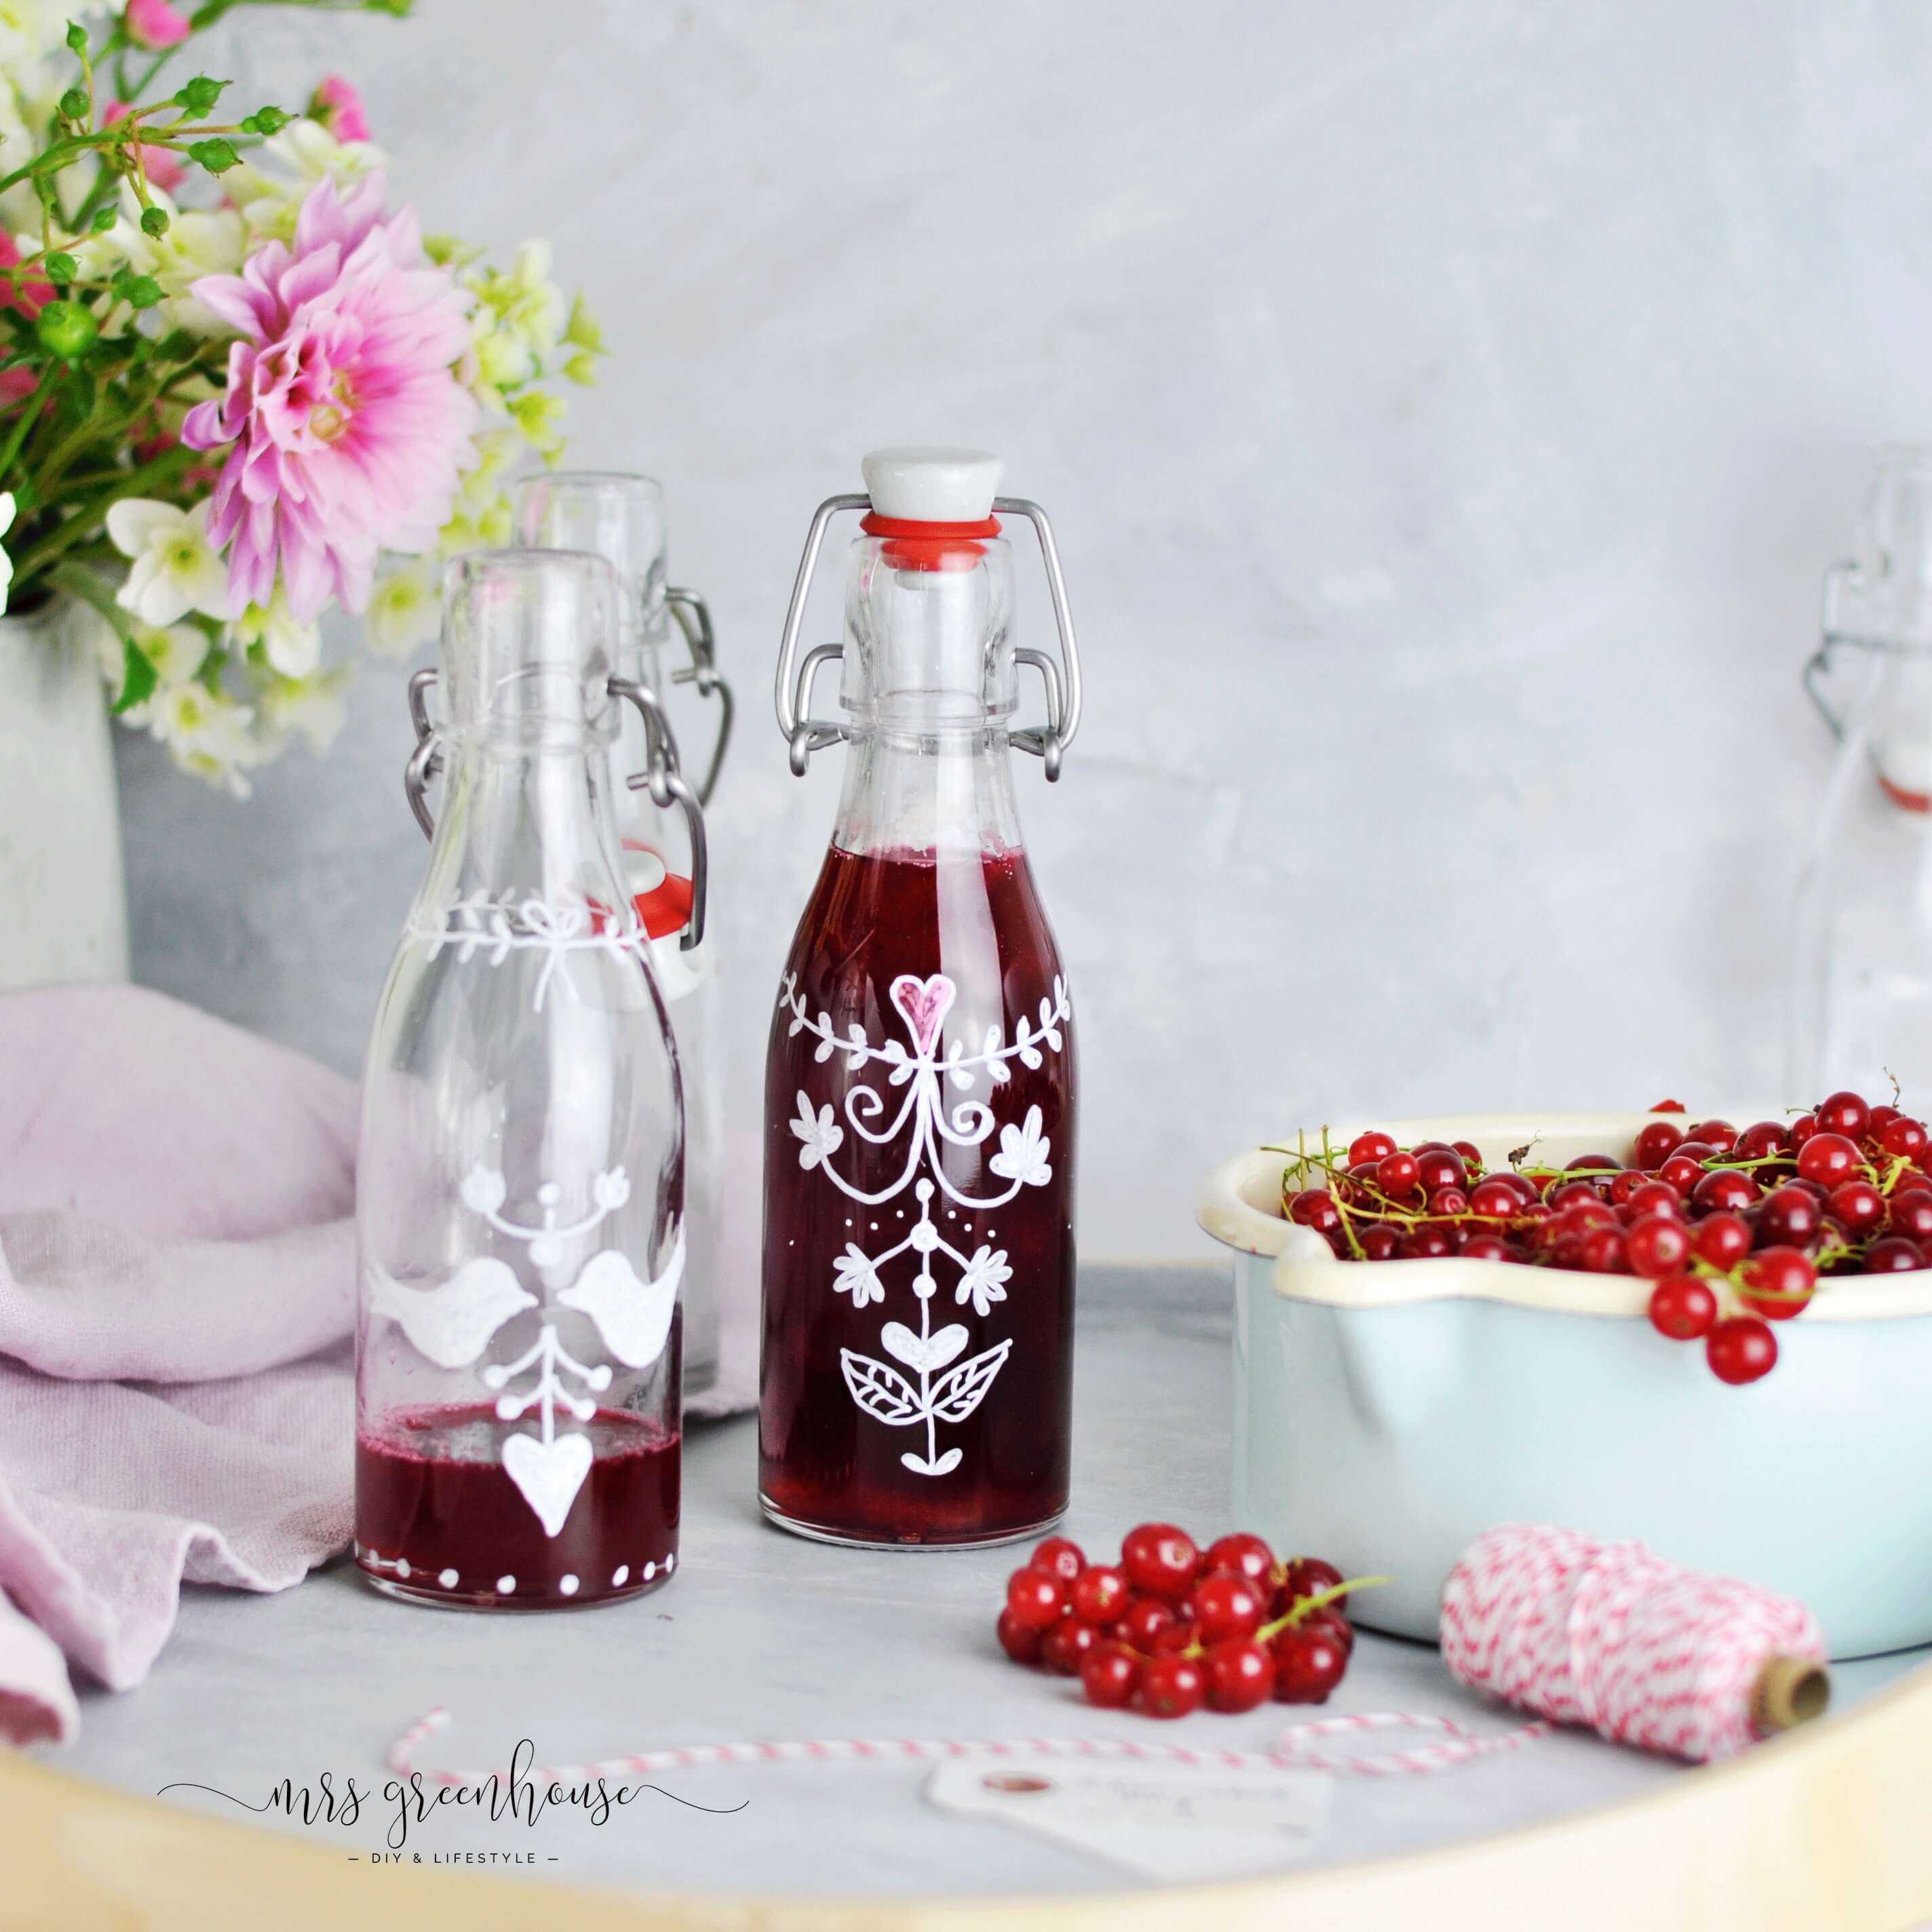 Johannisbeersirup in bemalten Flaschen